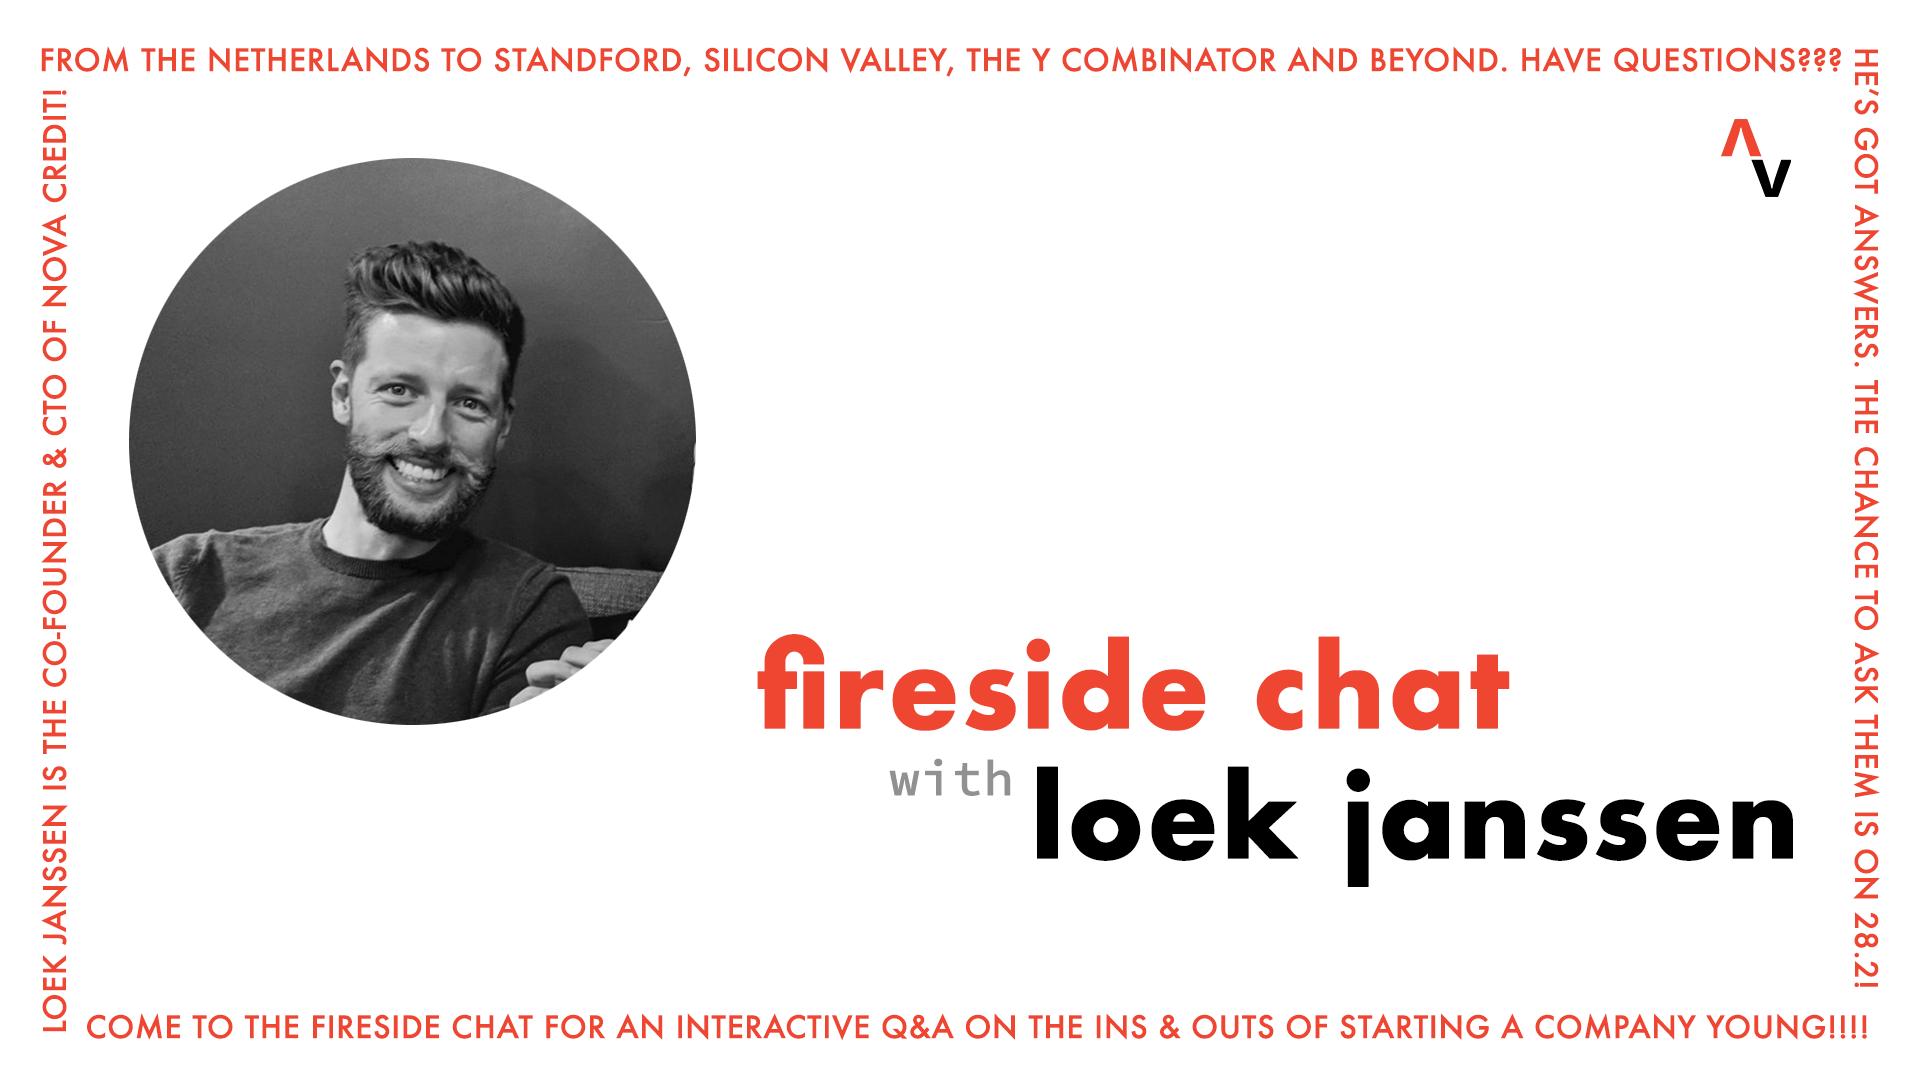 ASIF_Marketing_Masterclass_Fireside-Chat_Loek-janssen.png